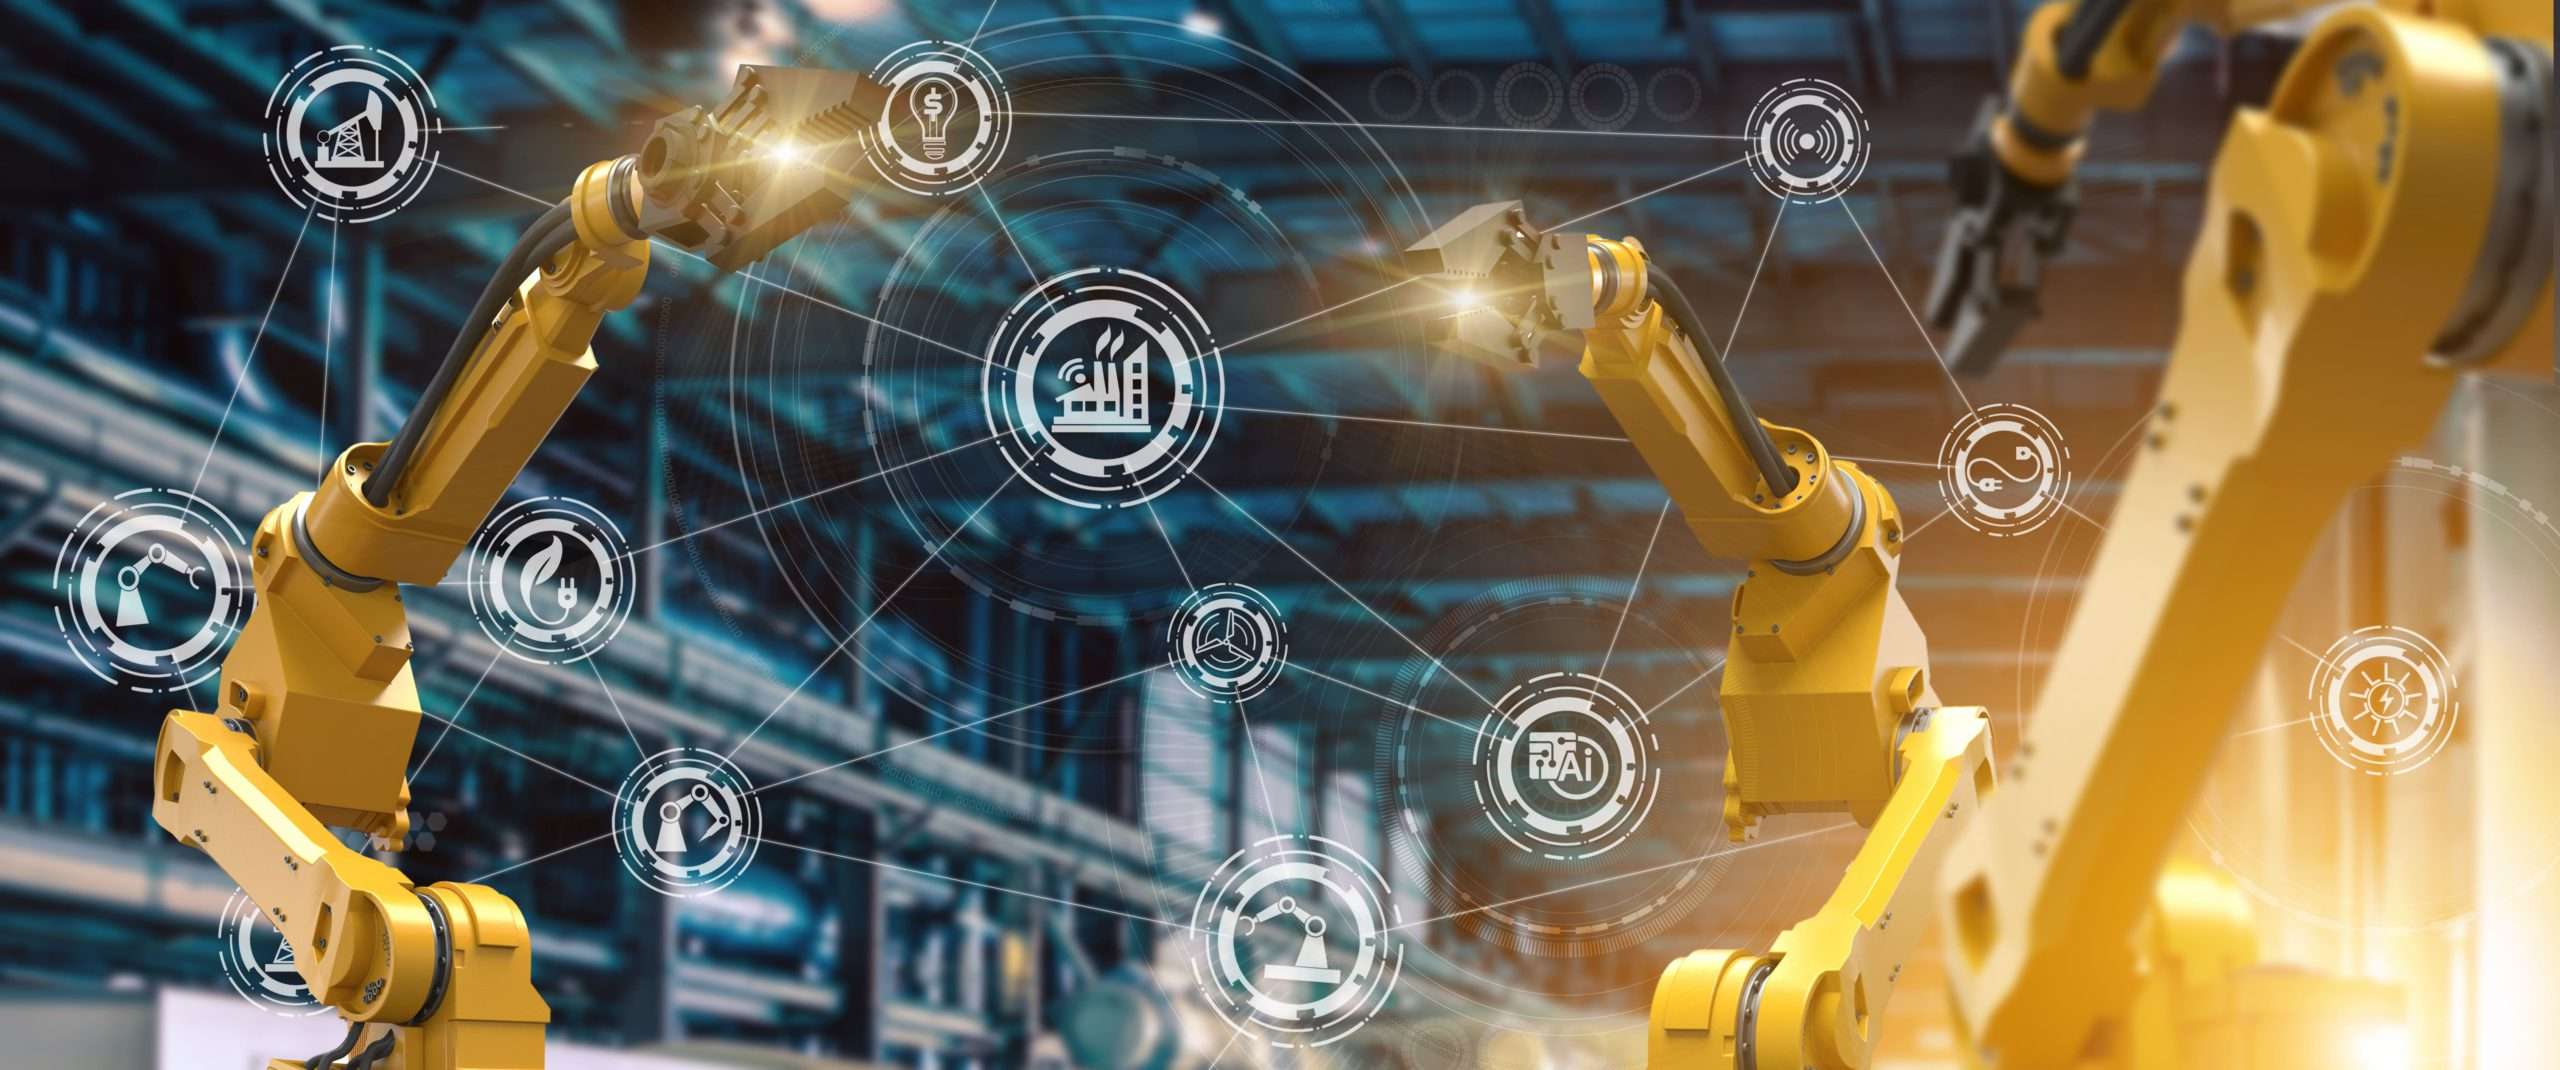 Smart Factory Industrie 4.0 MQTT OPCUA Kommunikationsprotokolle